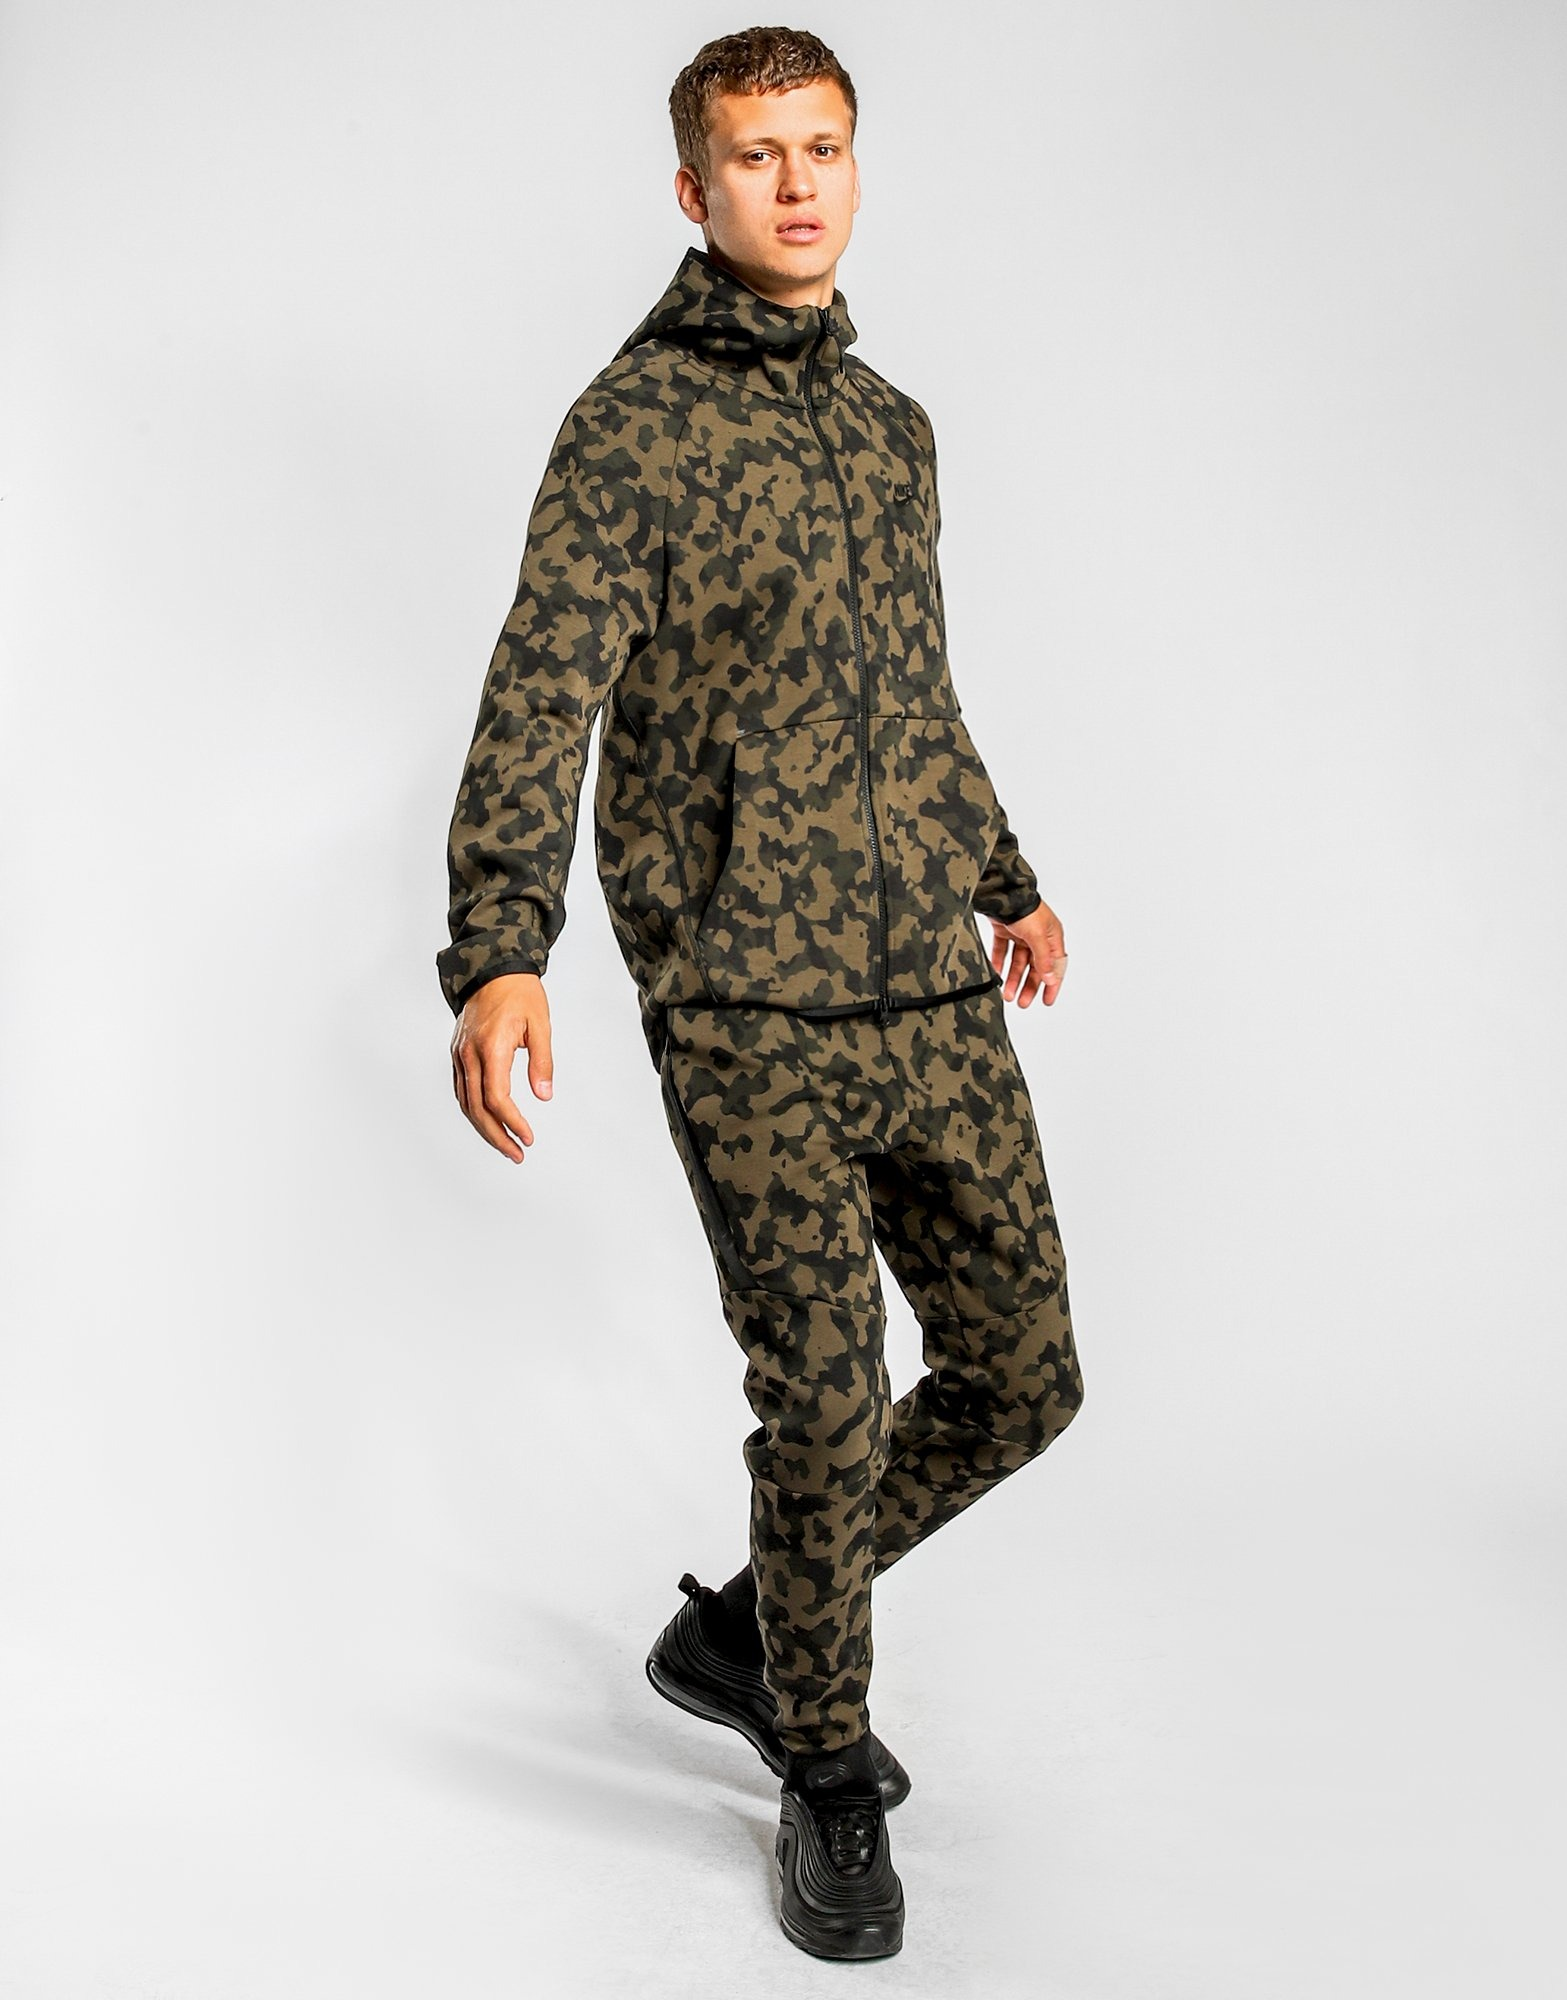 Men's Track Pants Clothing Nike Tech Fleece Camouflage